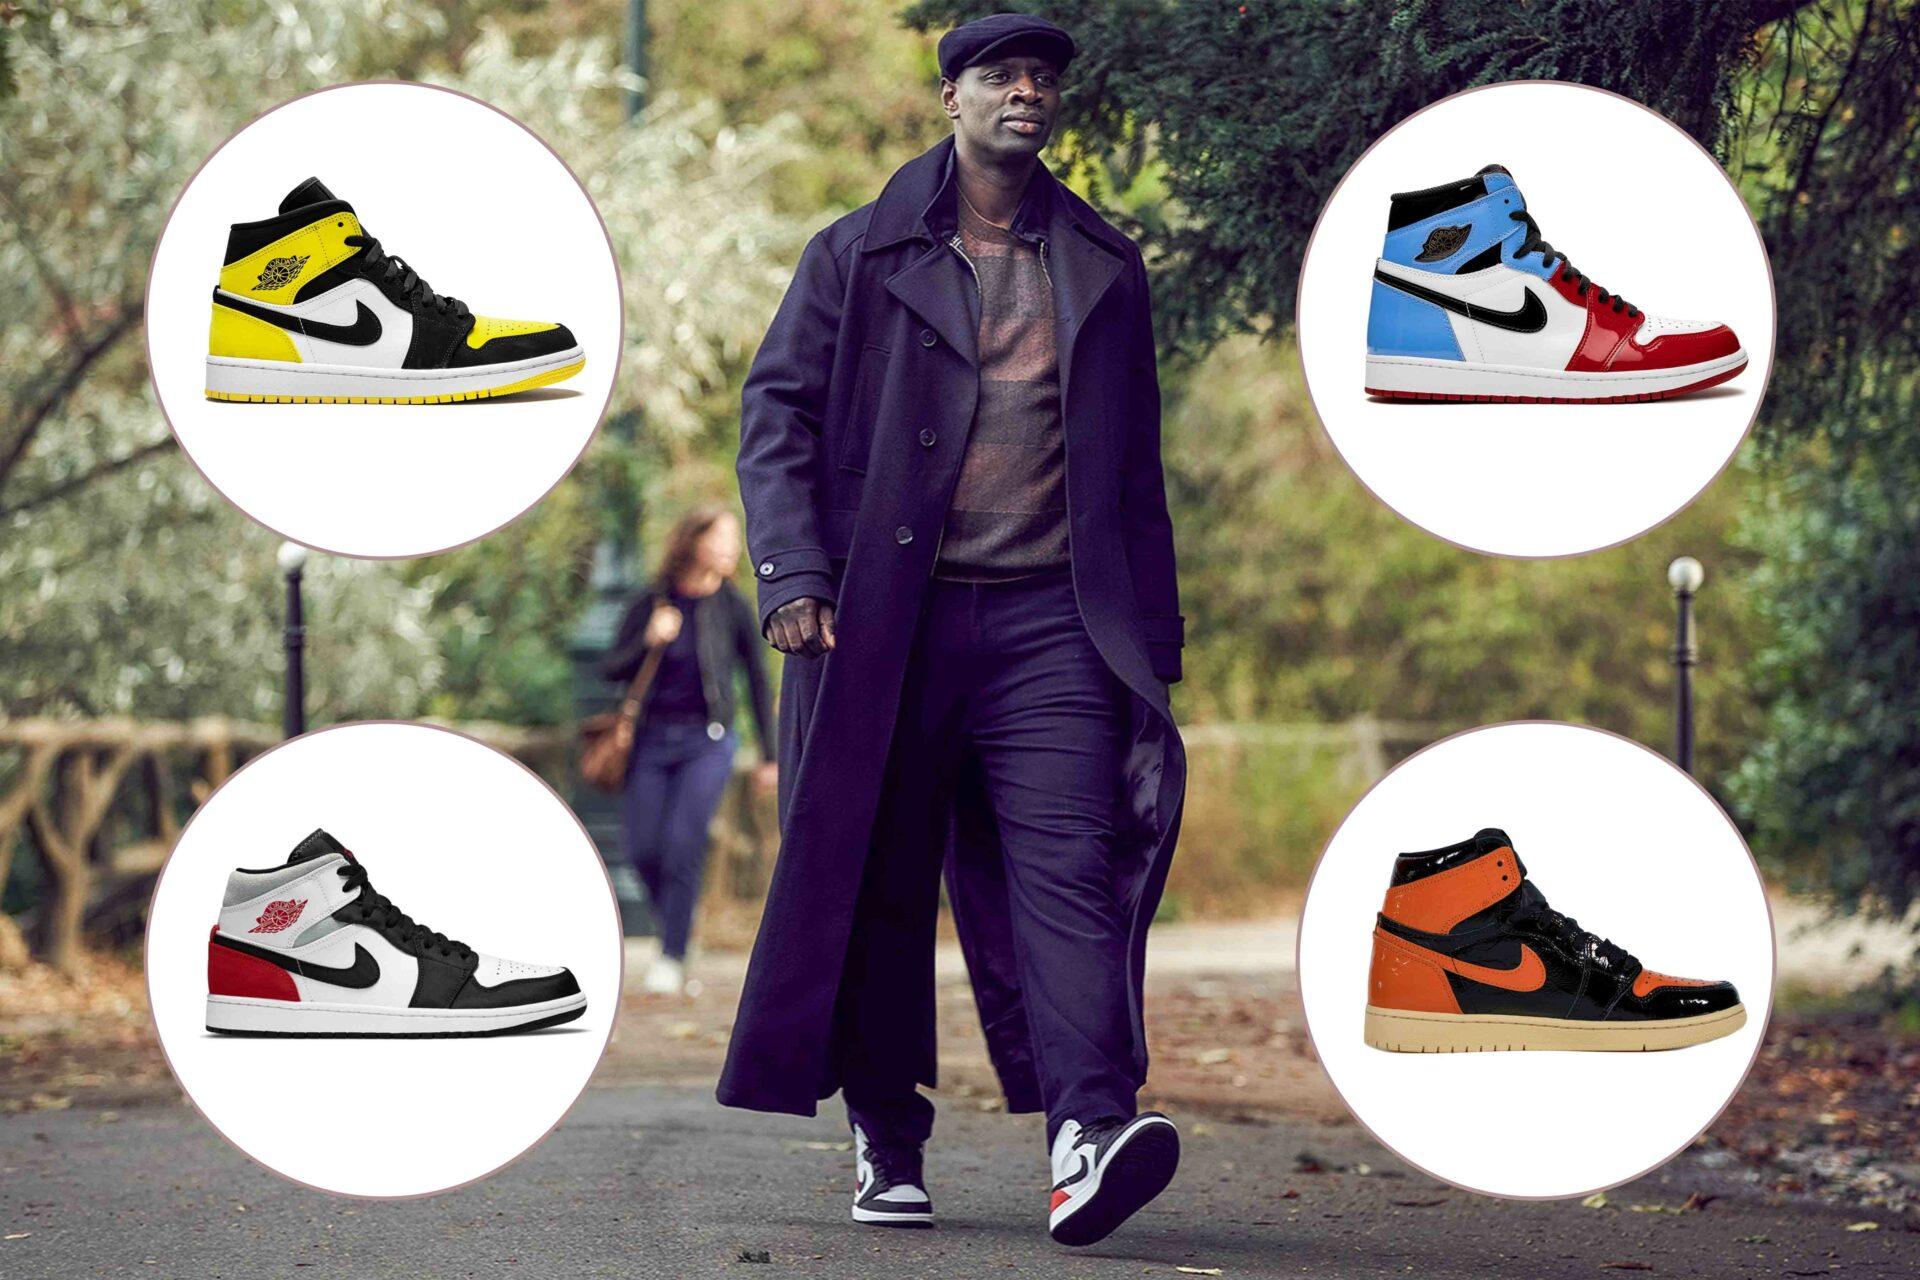 Netflix': alle Air Jordan 1 Sneakers von Lupin